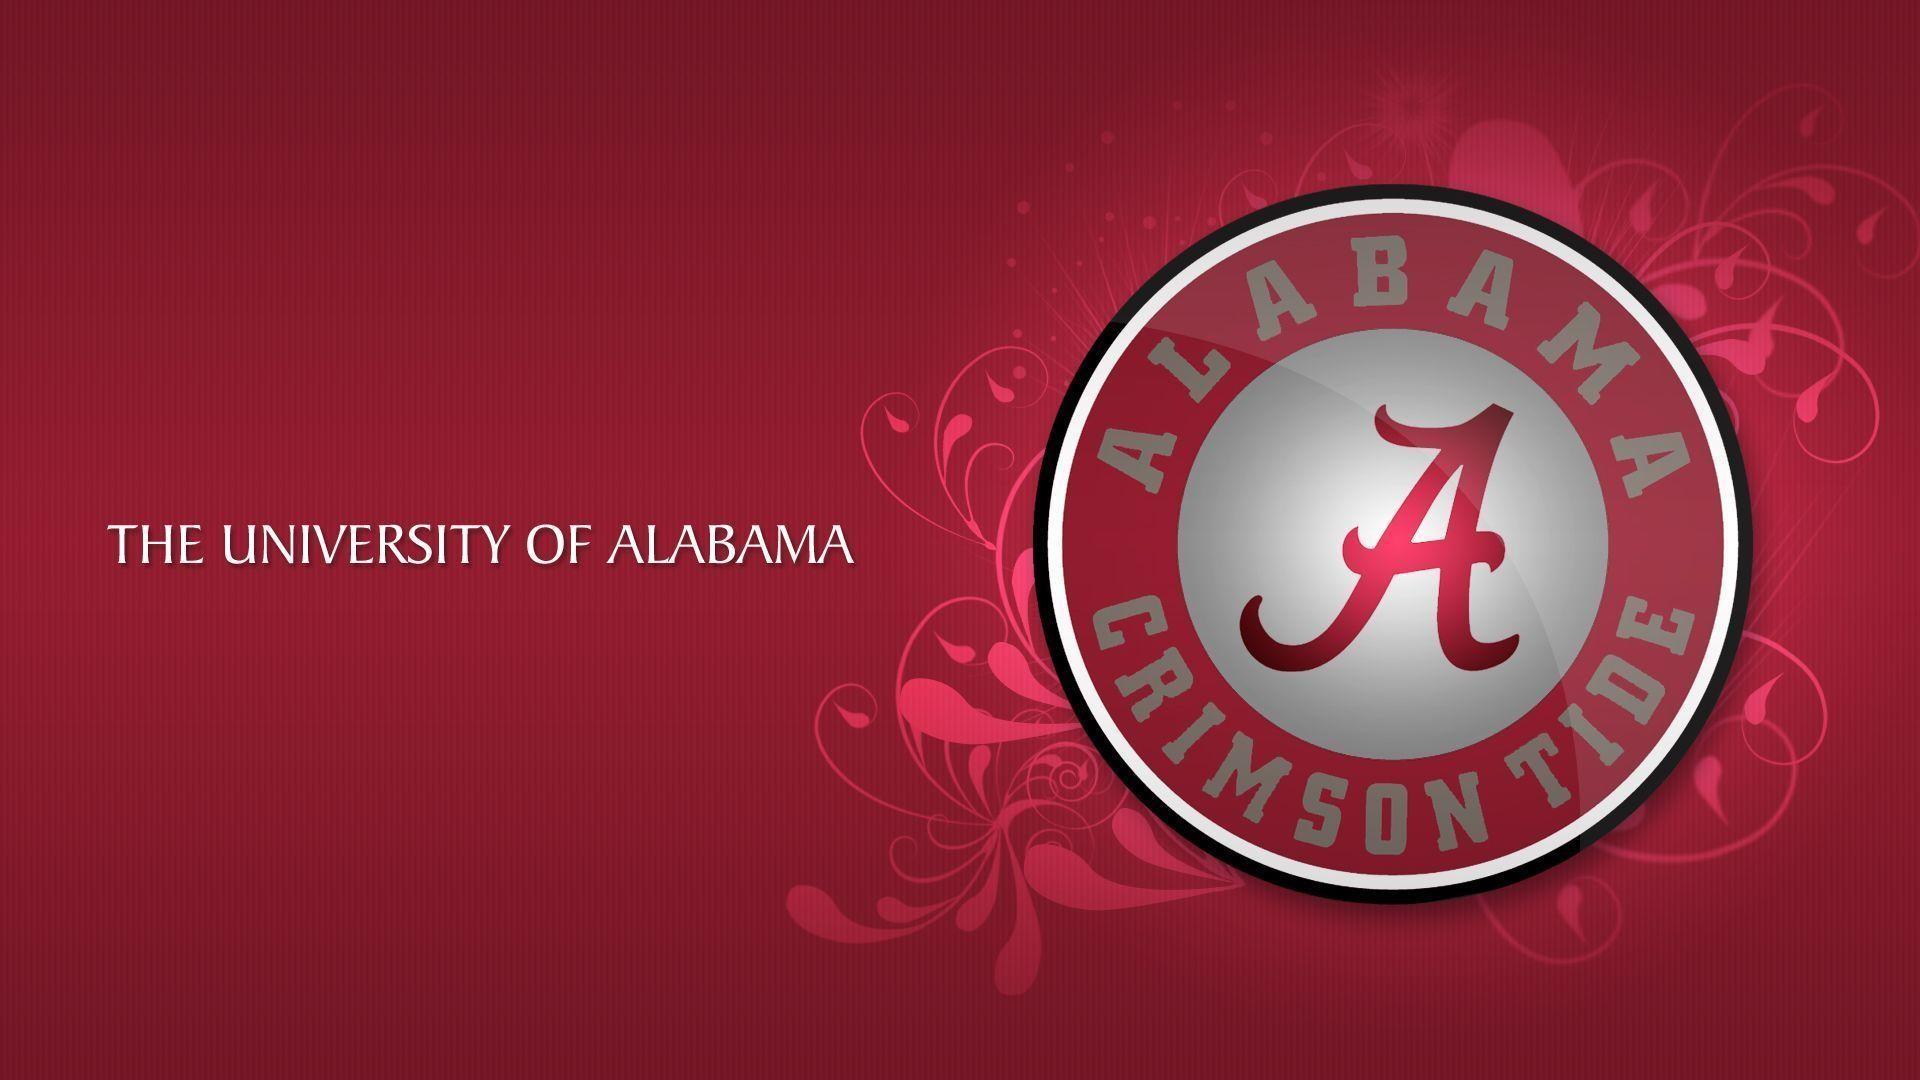 Alabama Crimson Tide Nike Football Uniform Helmetgame Wallpaper Twelve